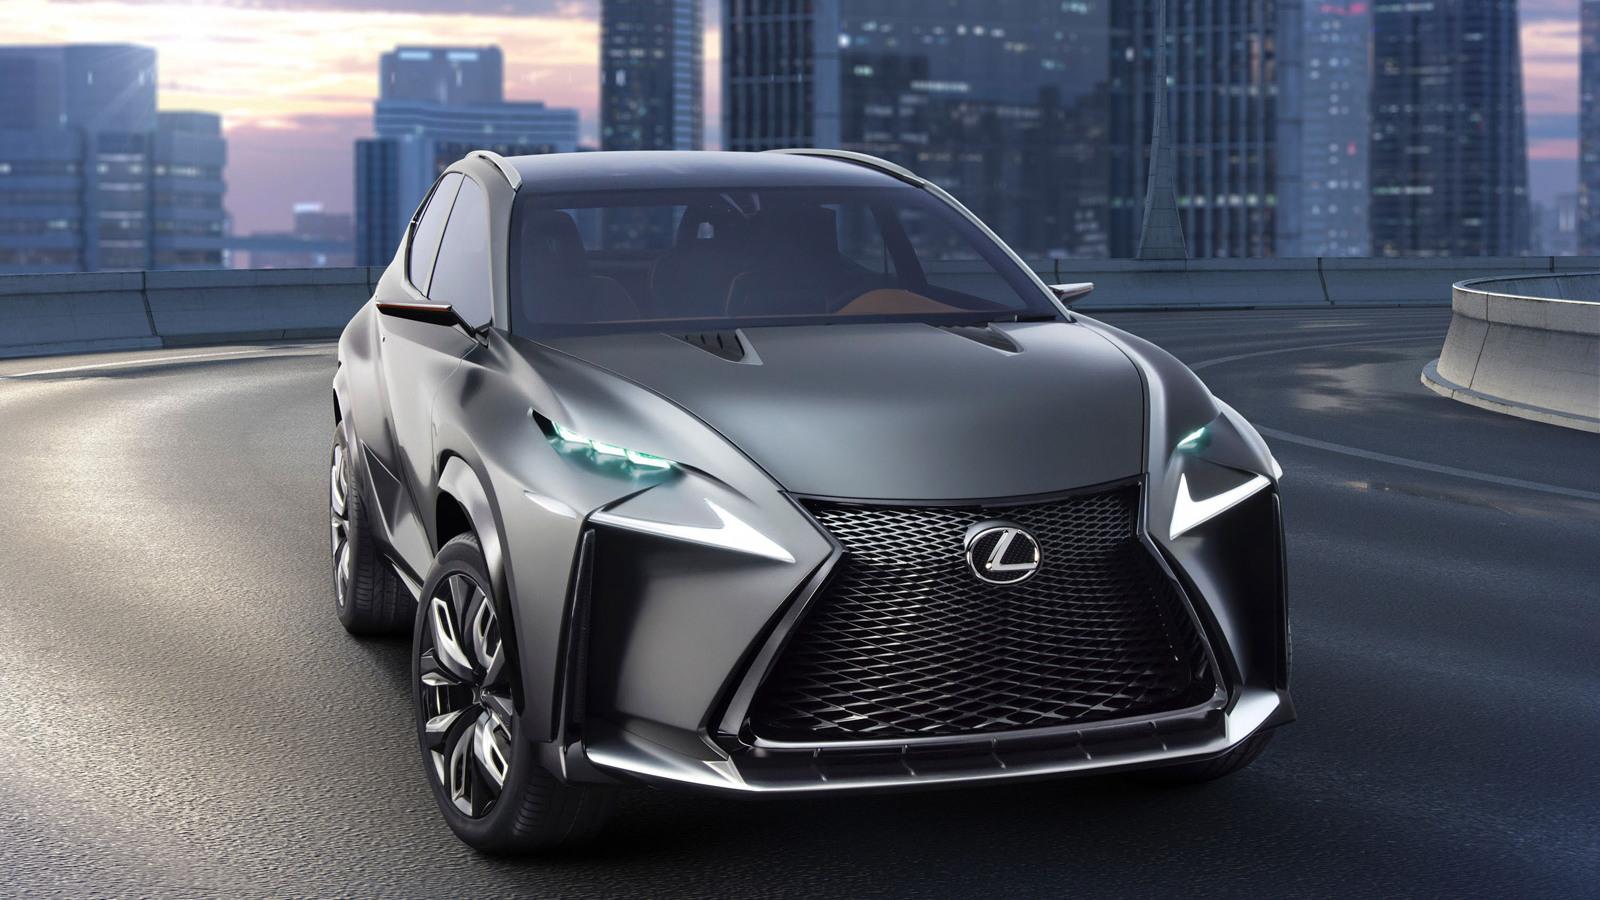 Lexus LF-NX turbo concept, 2013 Tokyo Motor Show